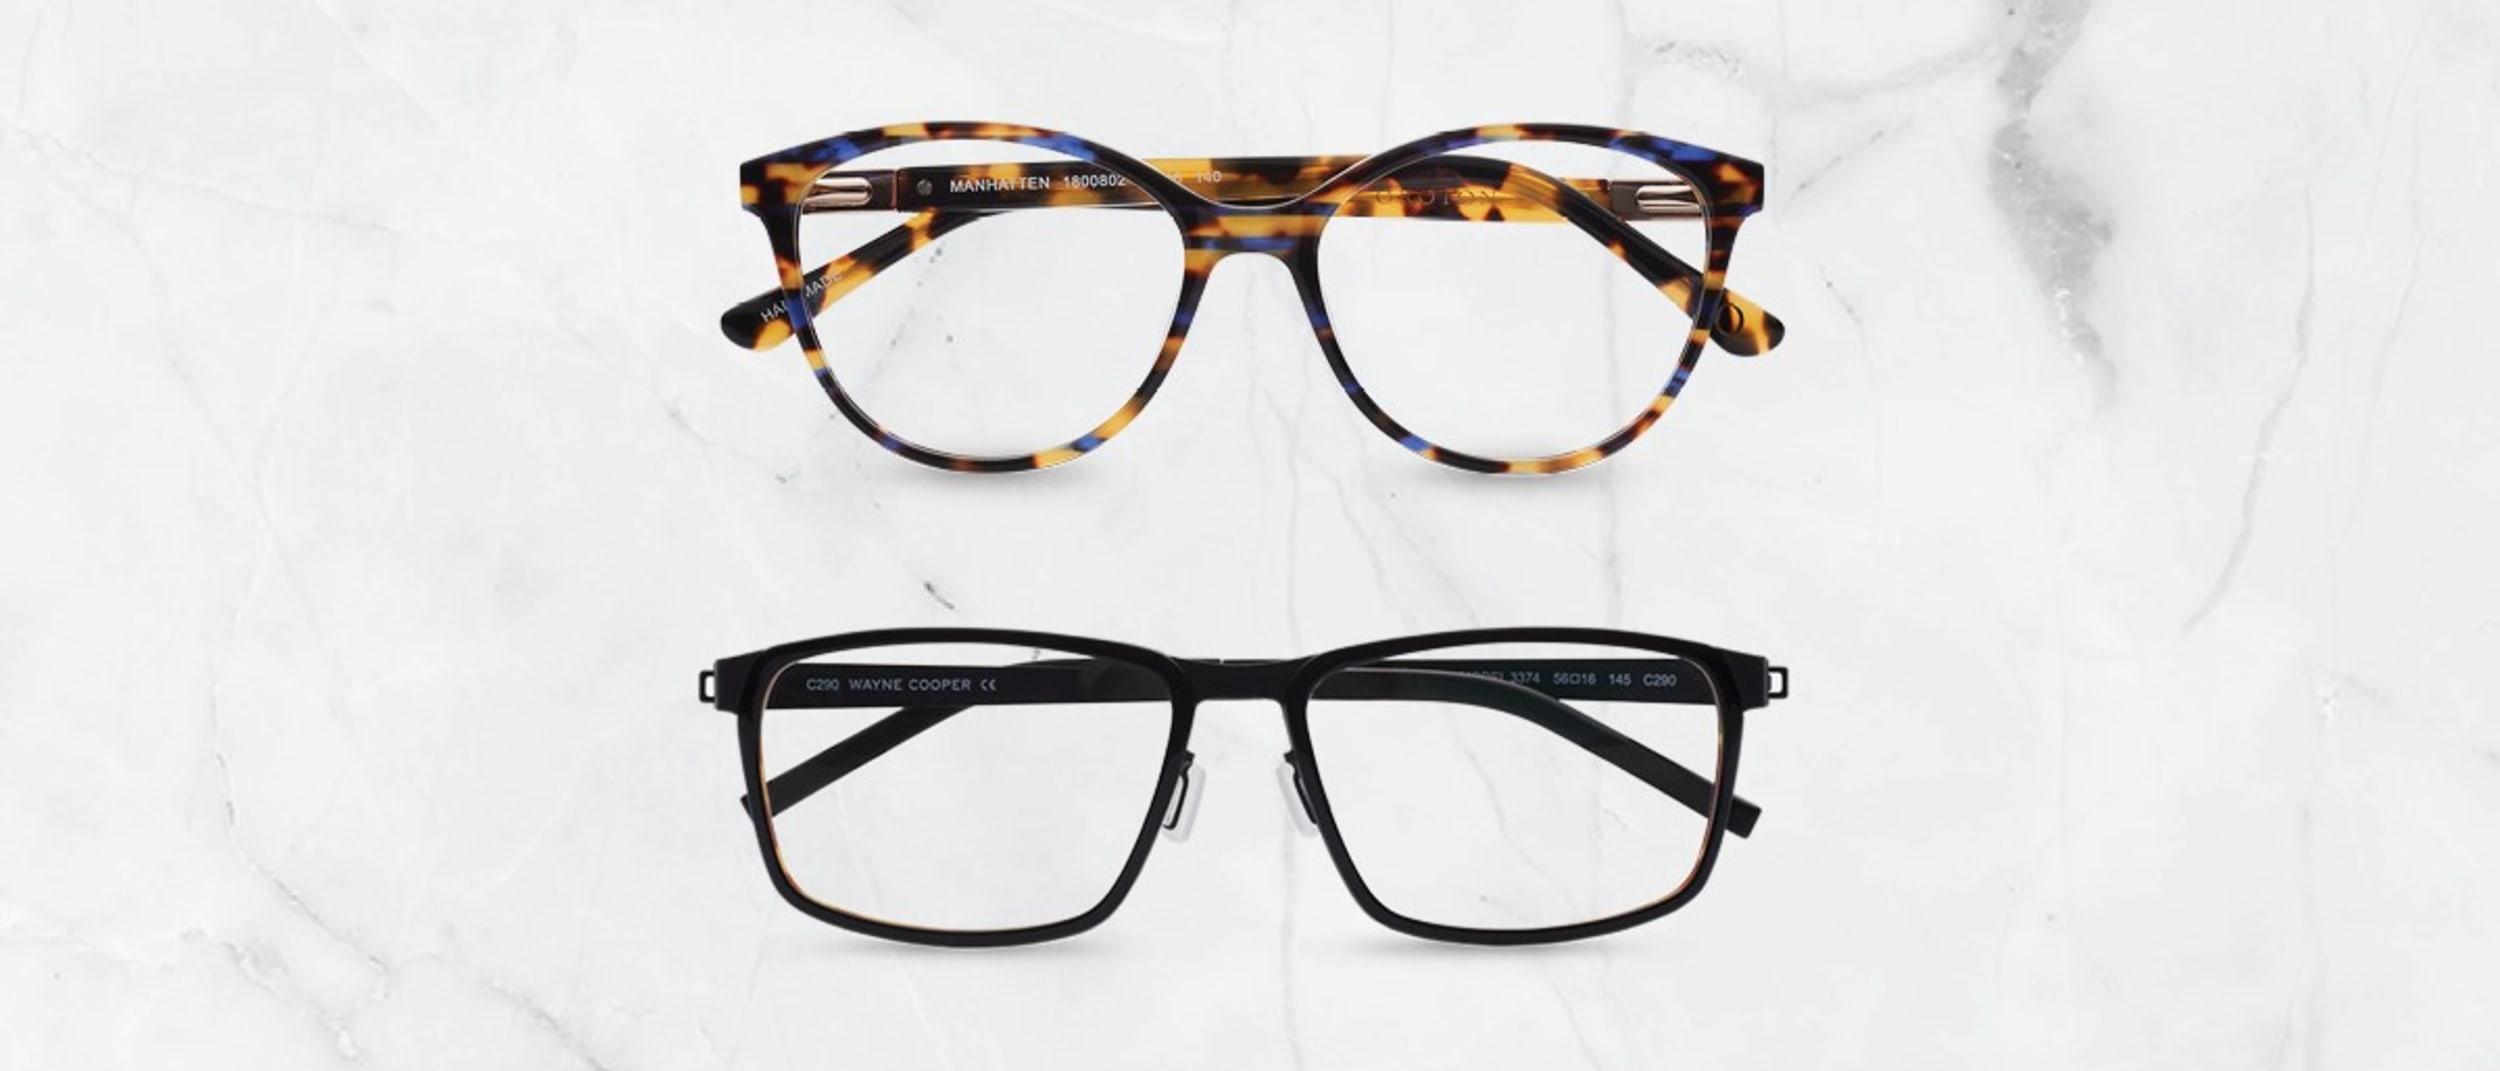 Bupa Optical: $100 off Oroton & Wayne Cooper frames